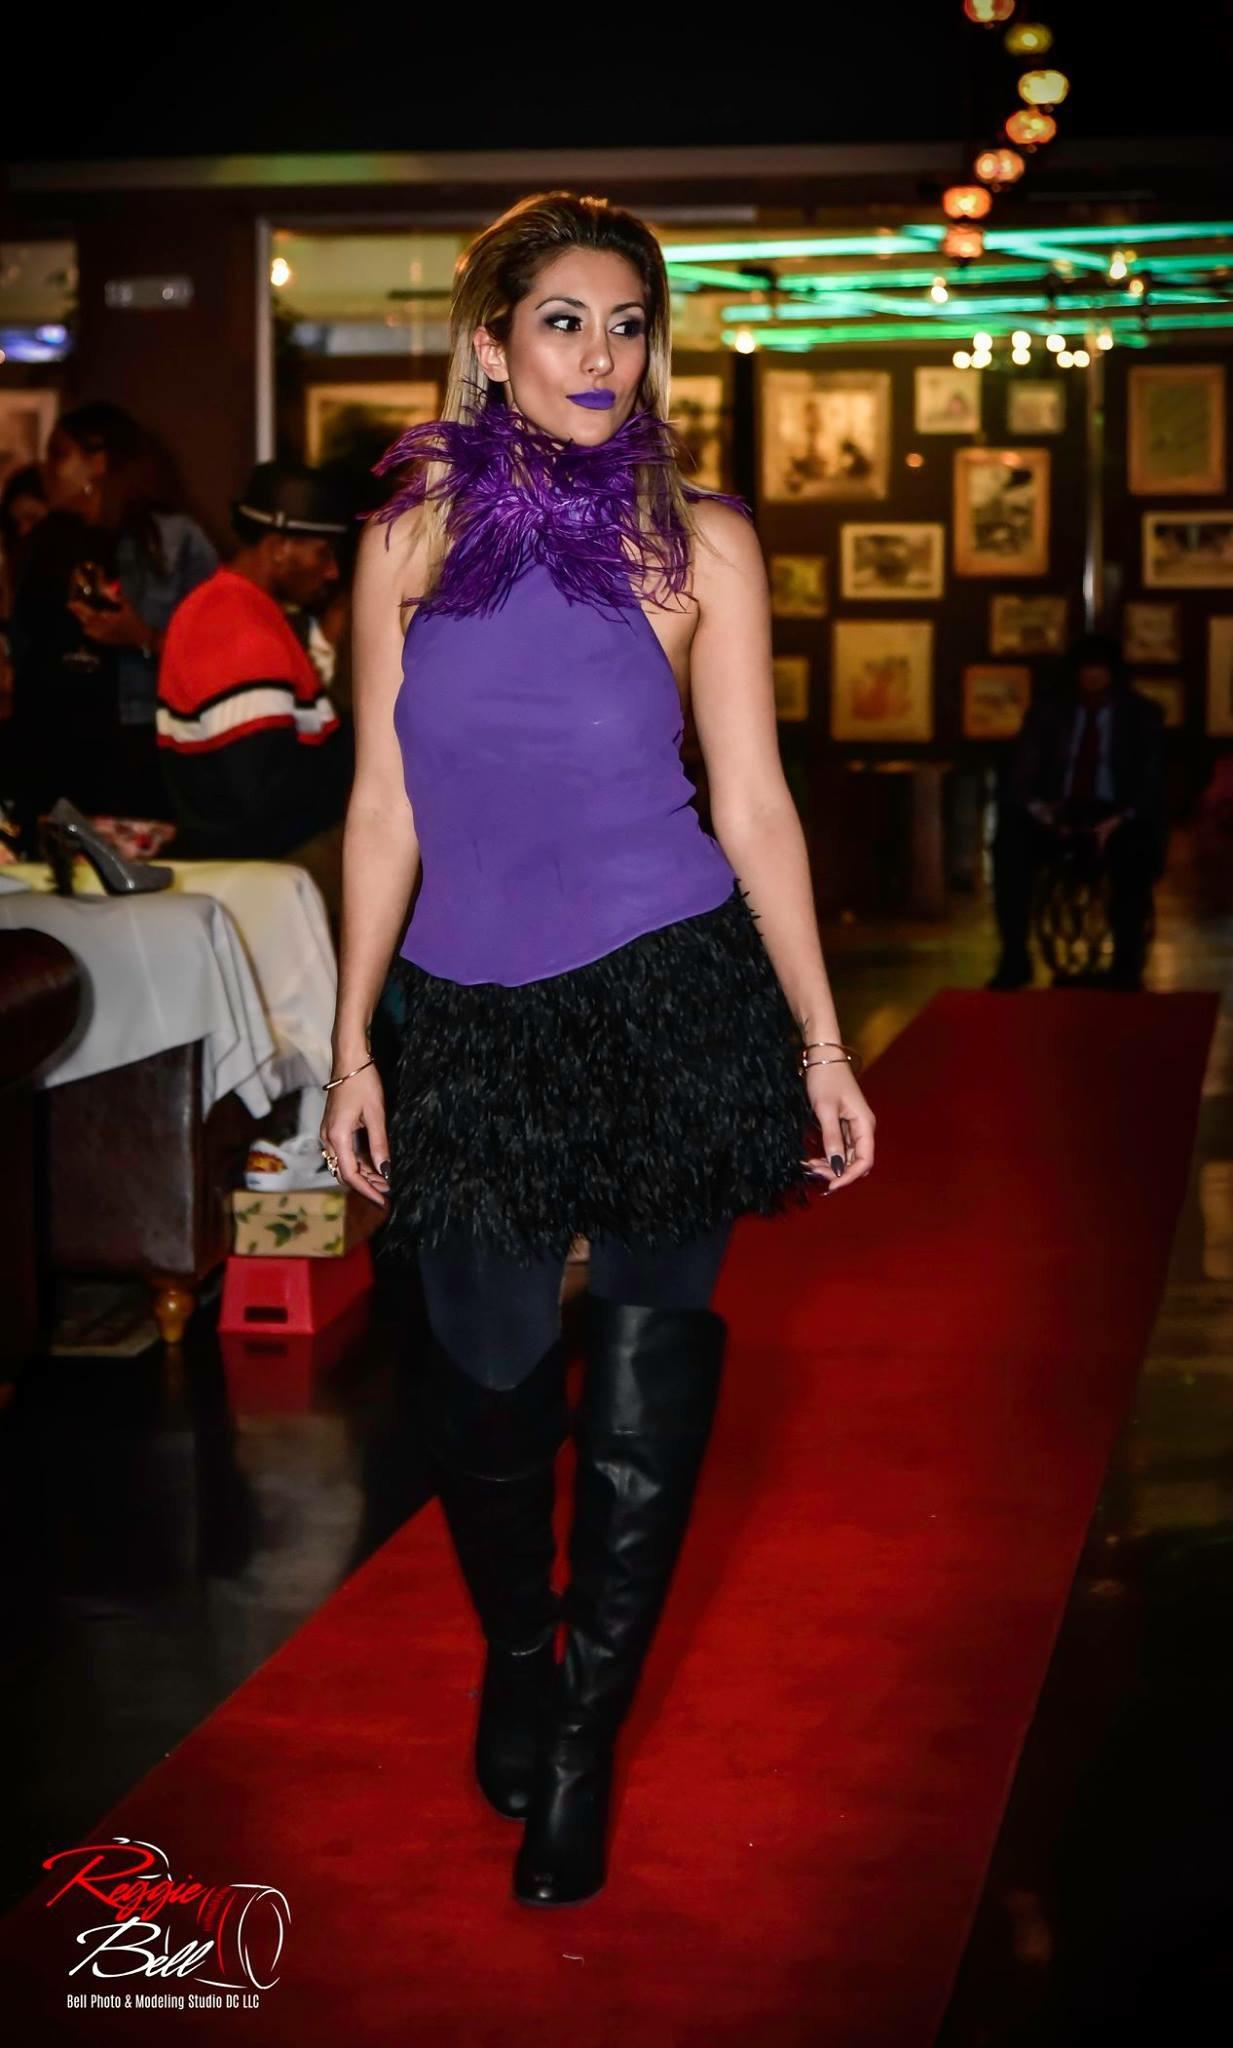 Savvy_Sexy_socia_womens_Networking_club_Keula_Binelly_Happy_hour_fashion_show_Greenhouse_Bistro_Couture